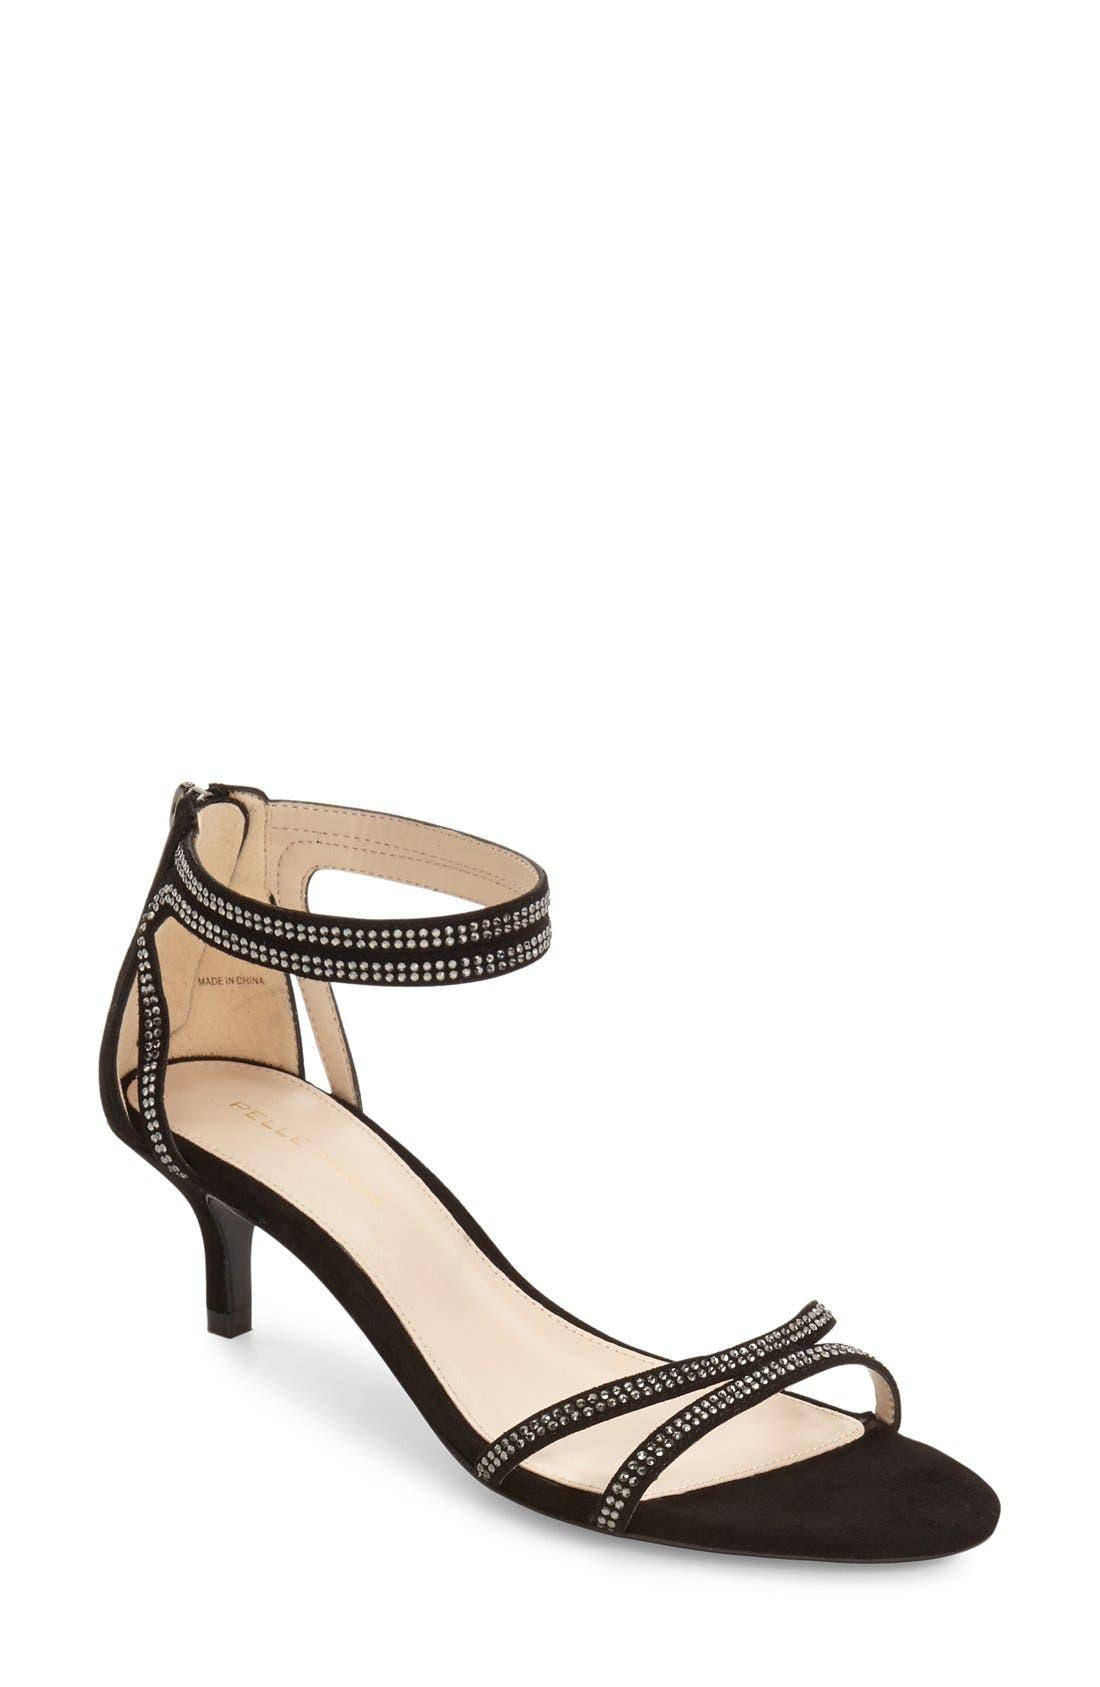 Fillis Ankle Strap Sandal,                             Main thumbnail 1, color,                             001